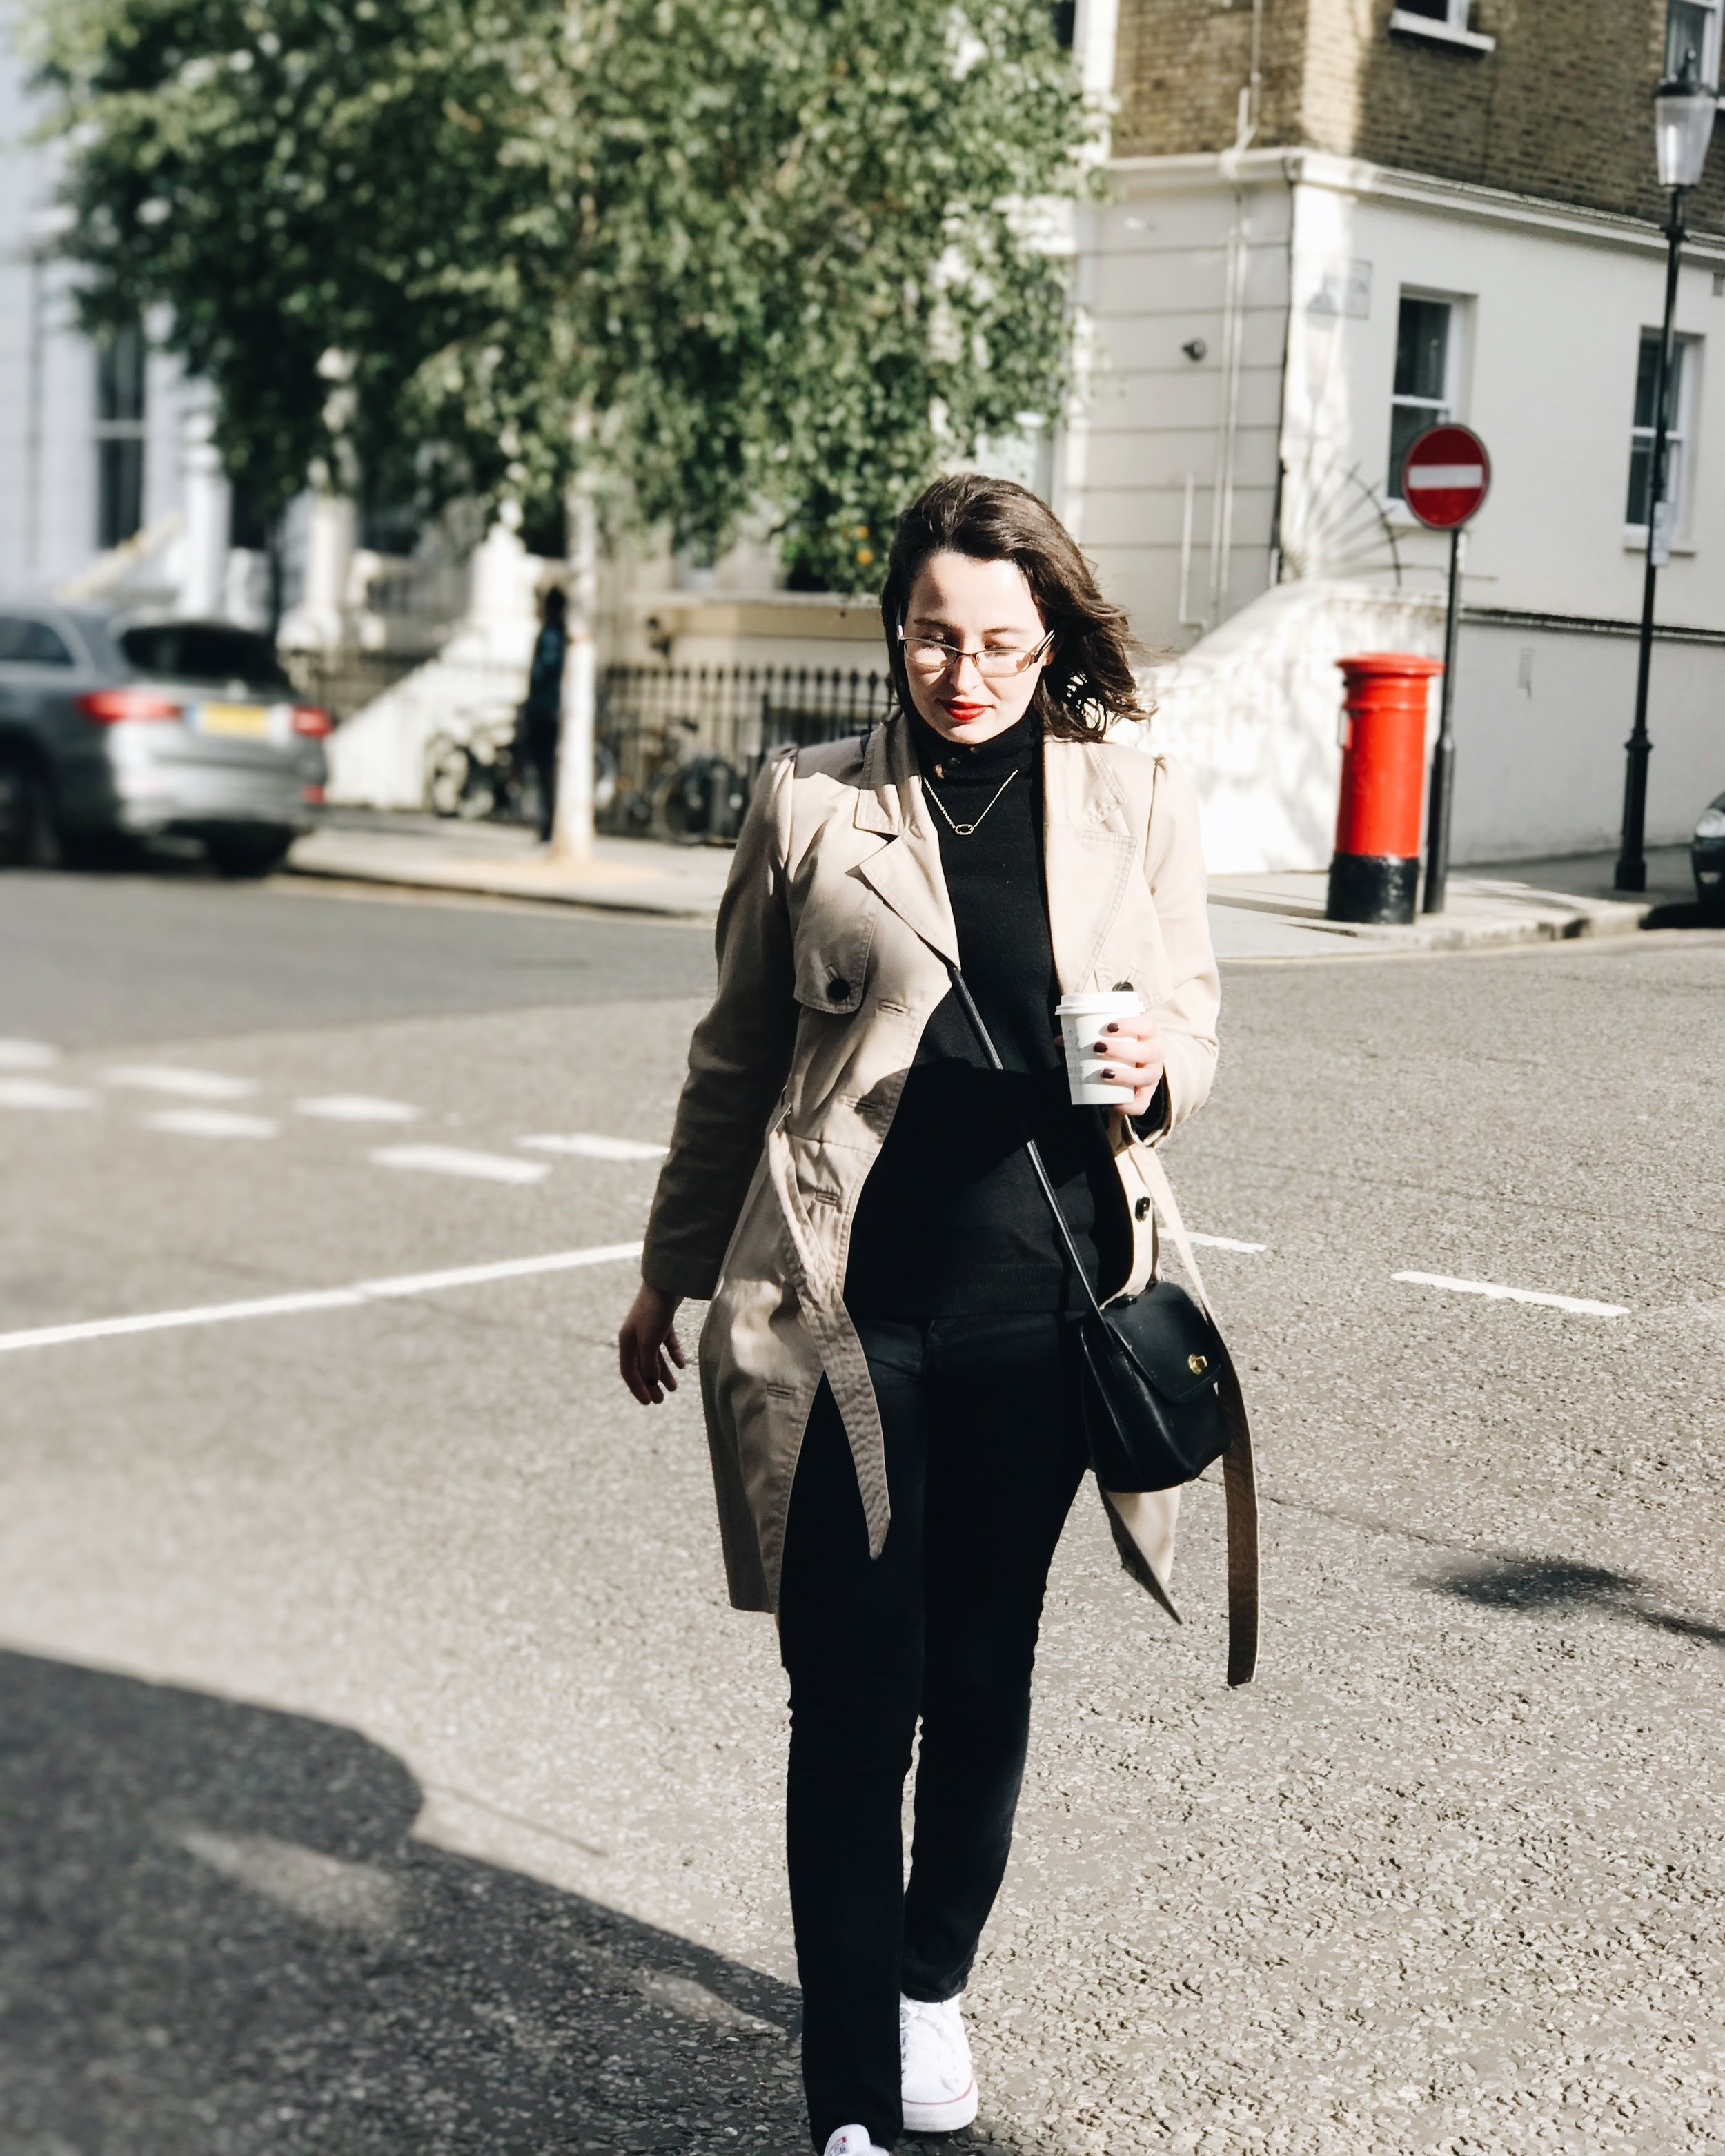 London Fashion Outfit